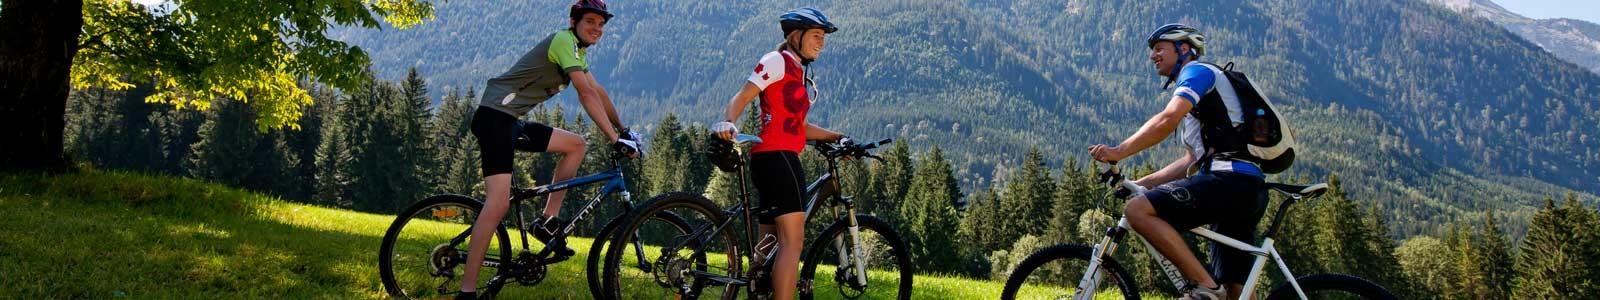 Radeln Mountainbiken in Berchtesgaden